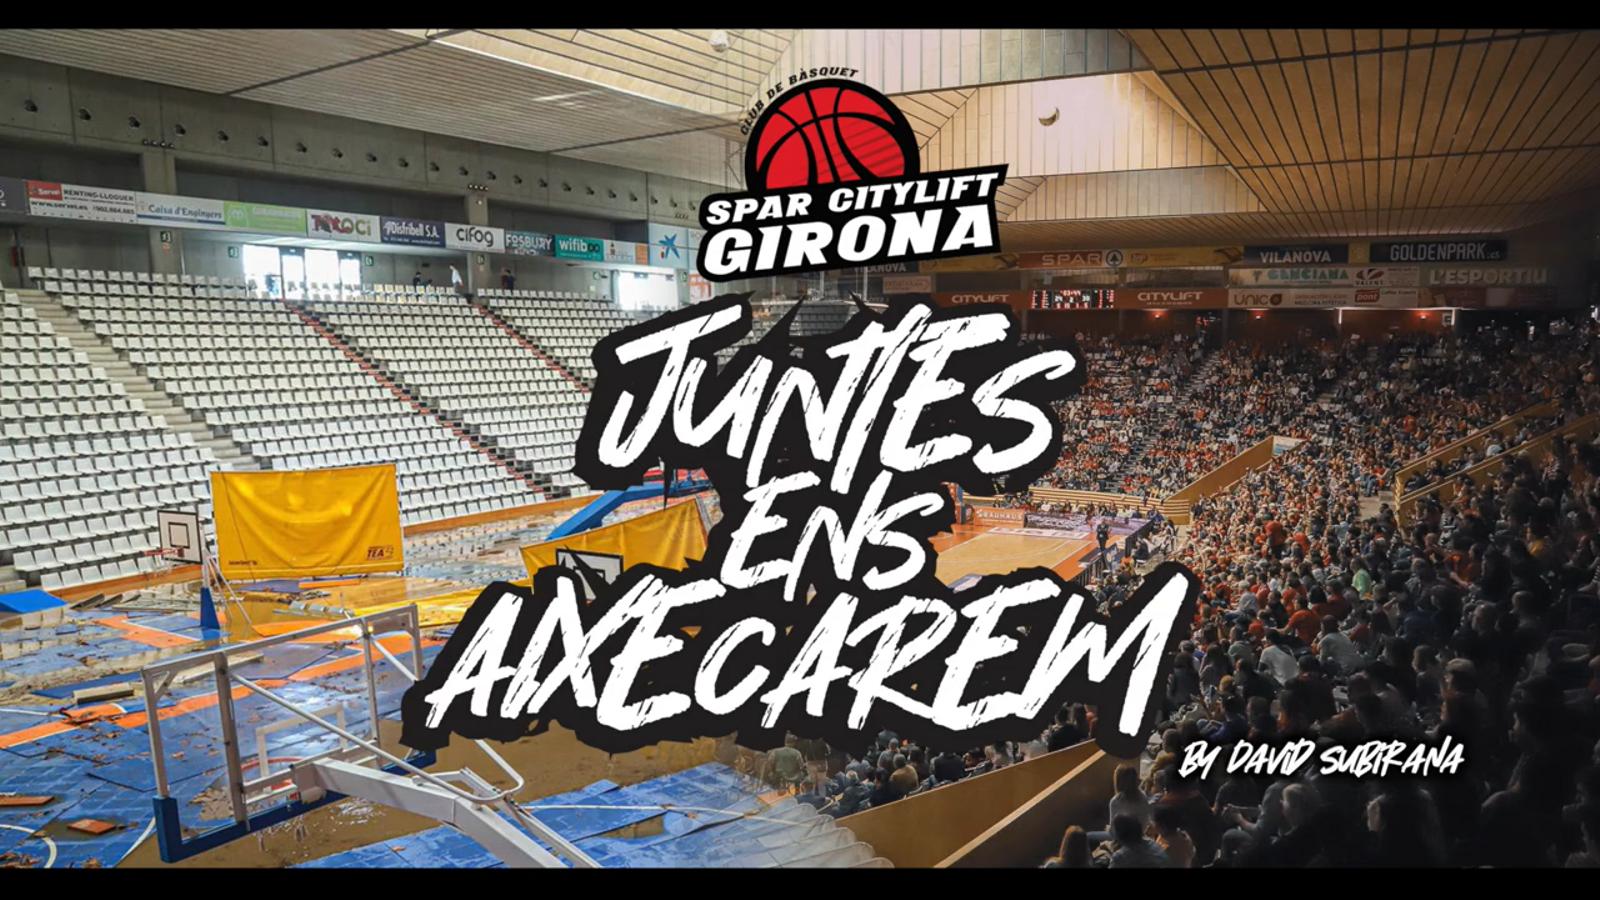 Campanya de l'Spar Citylift Girona